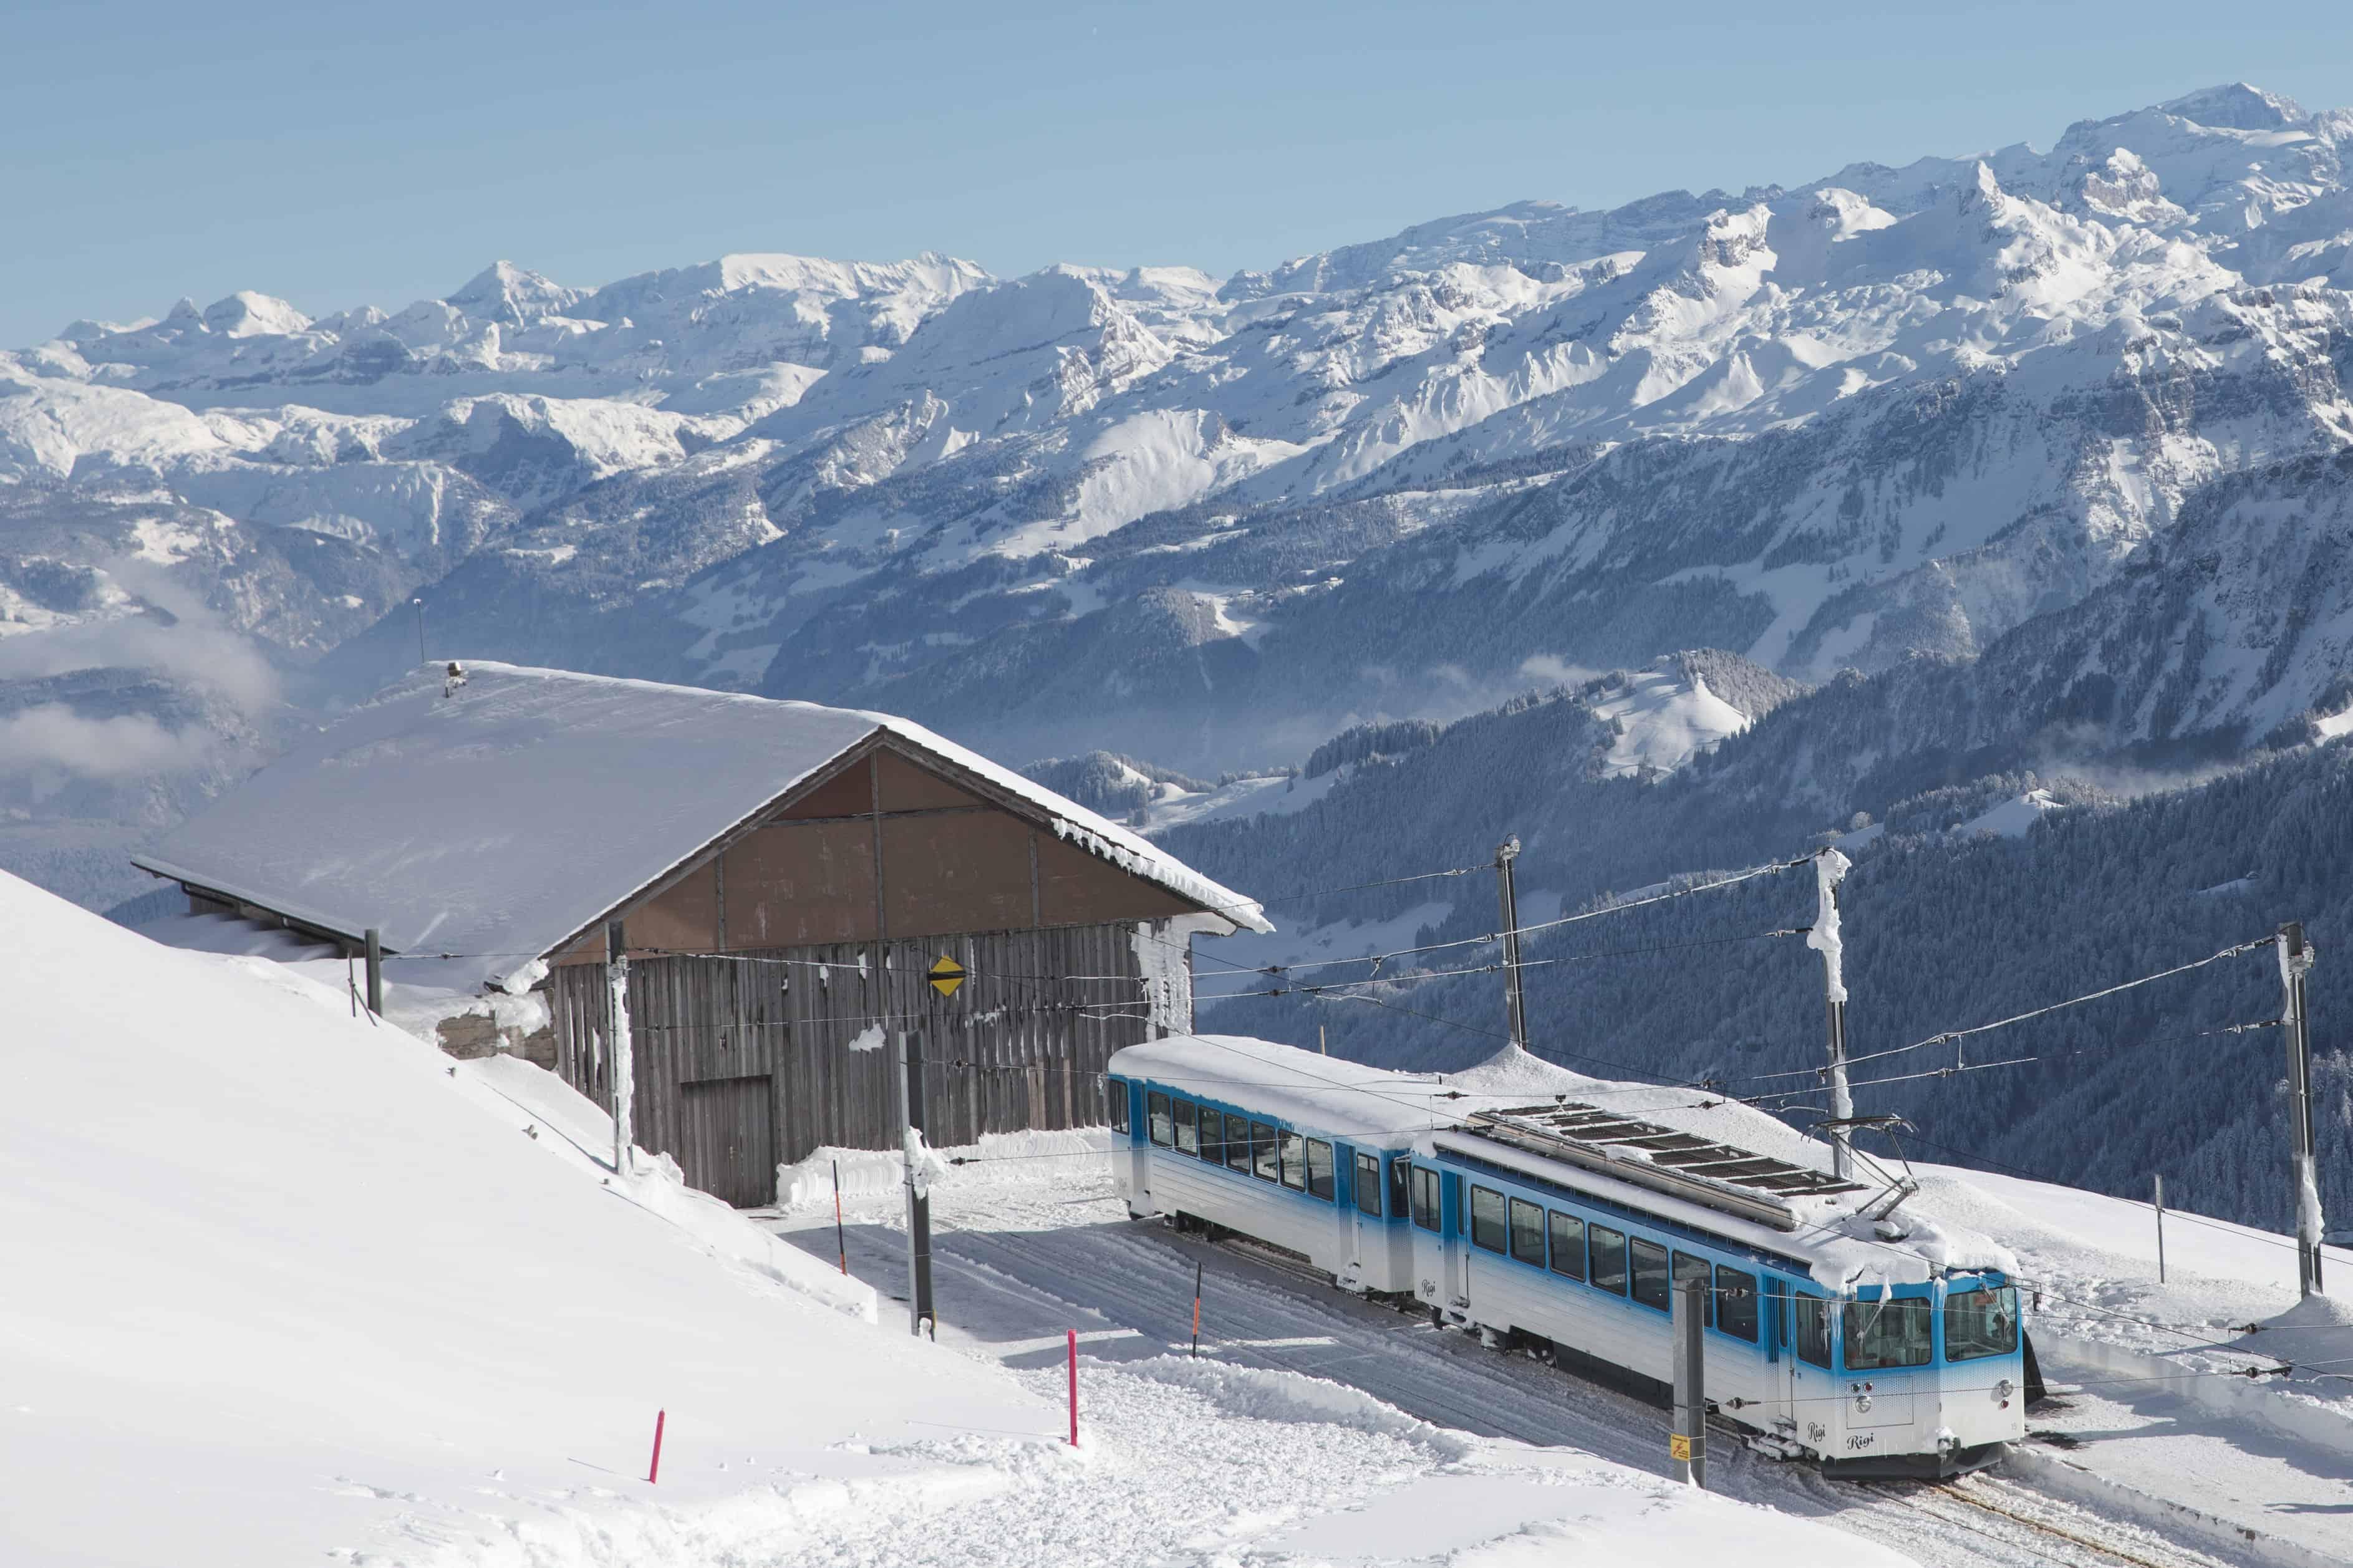 Rigi in Switzerland has beautiful views of mountain peaks